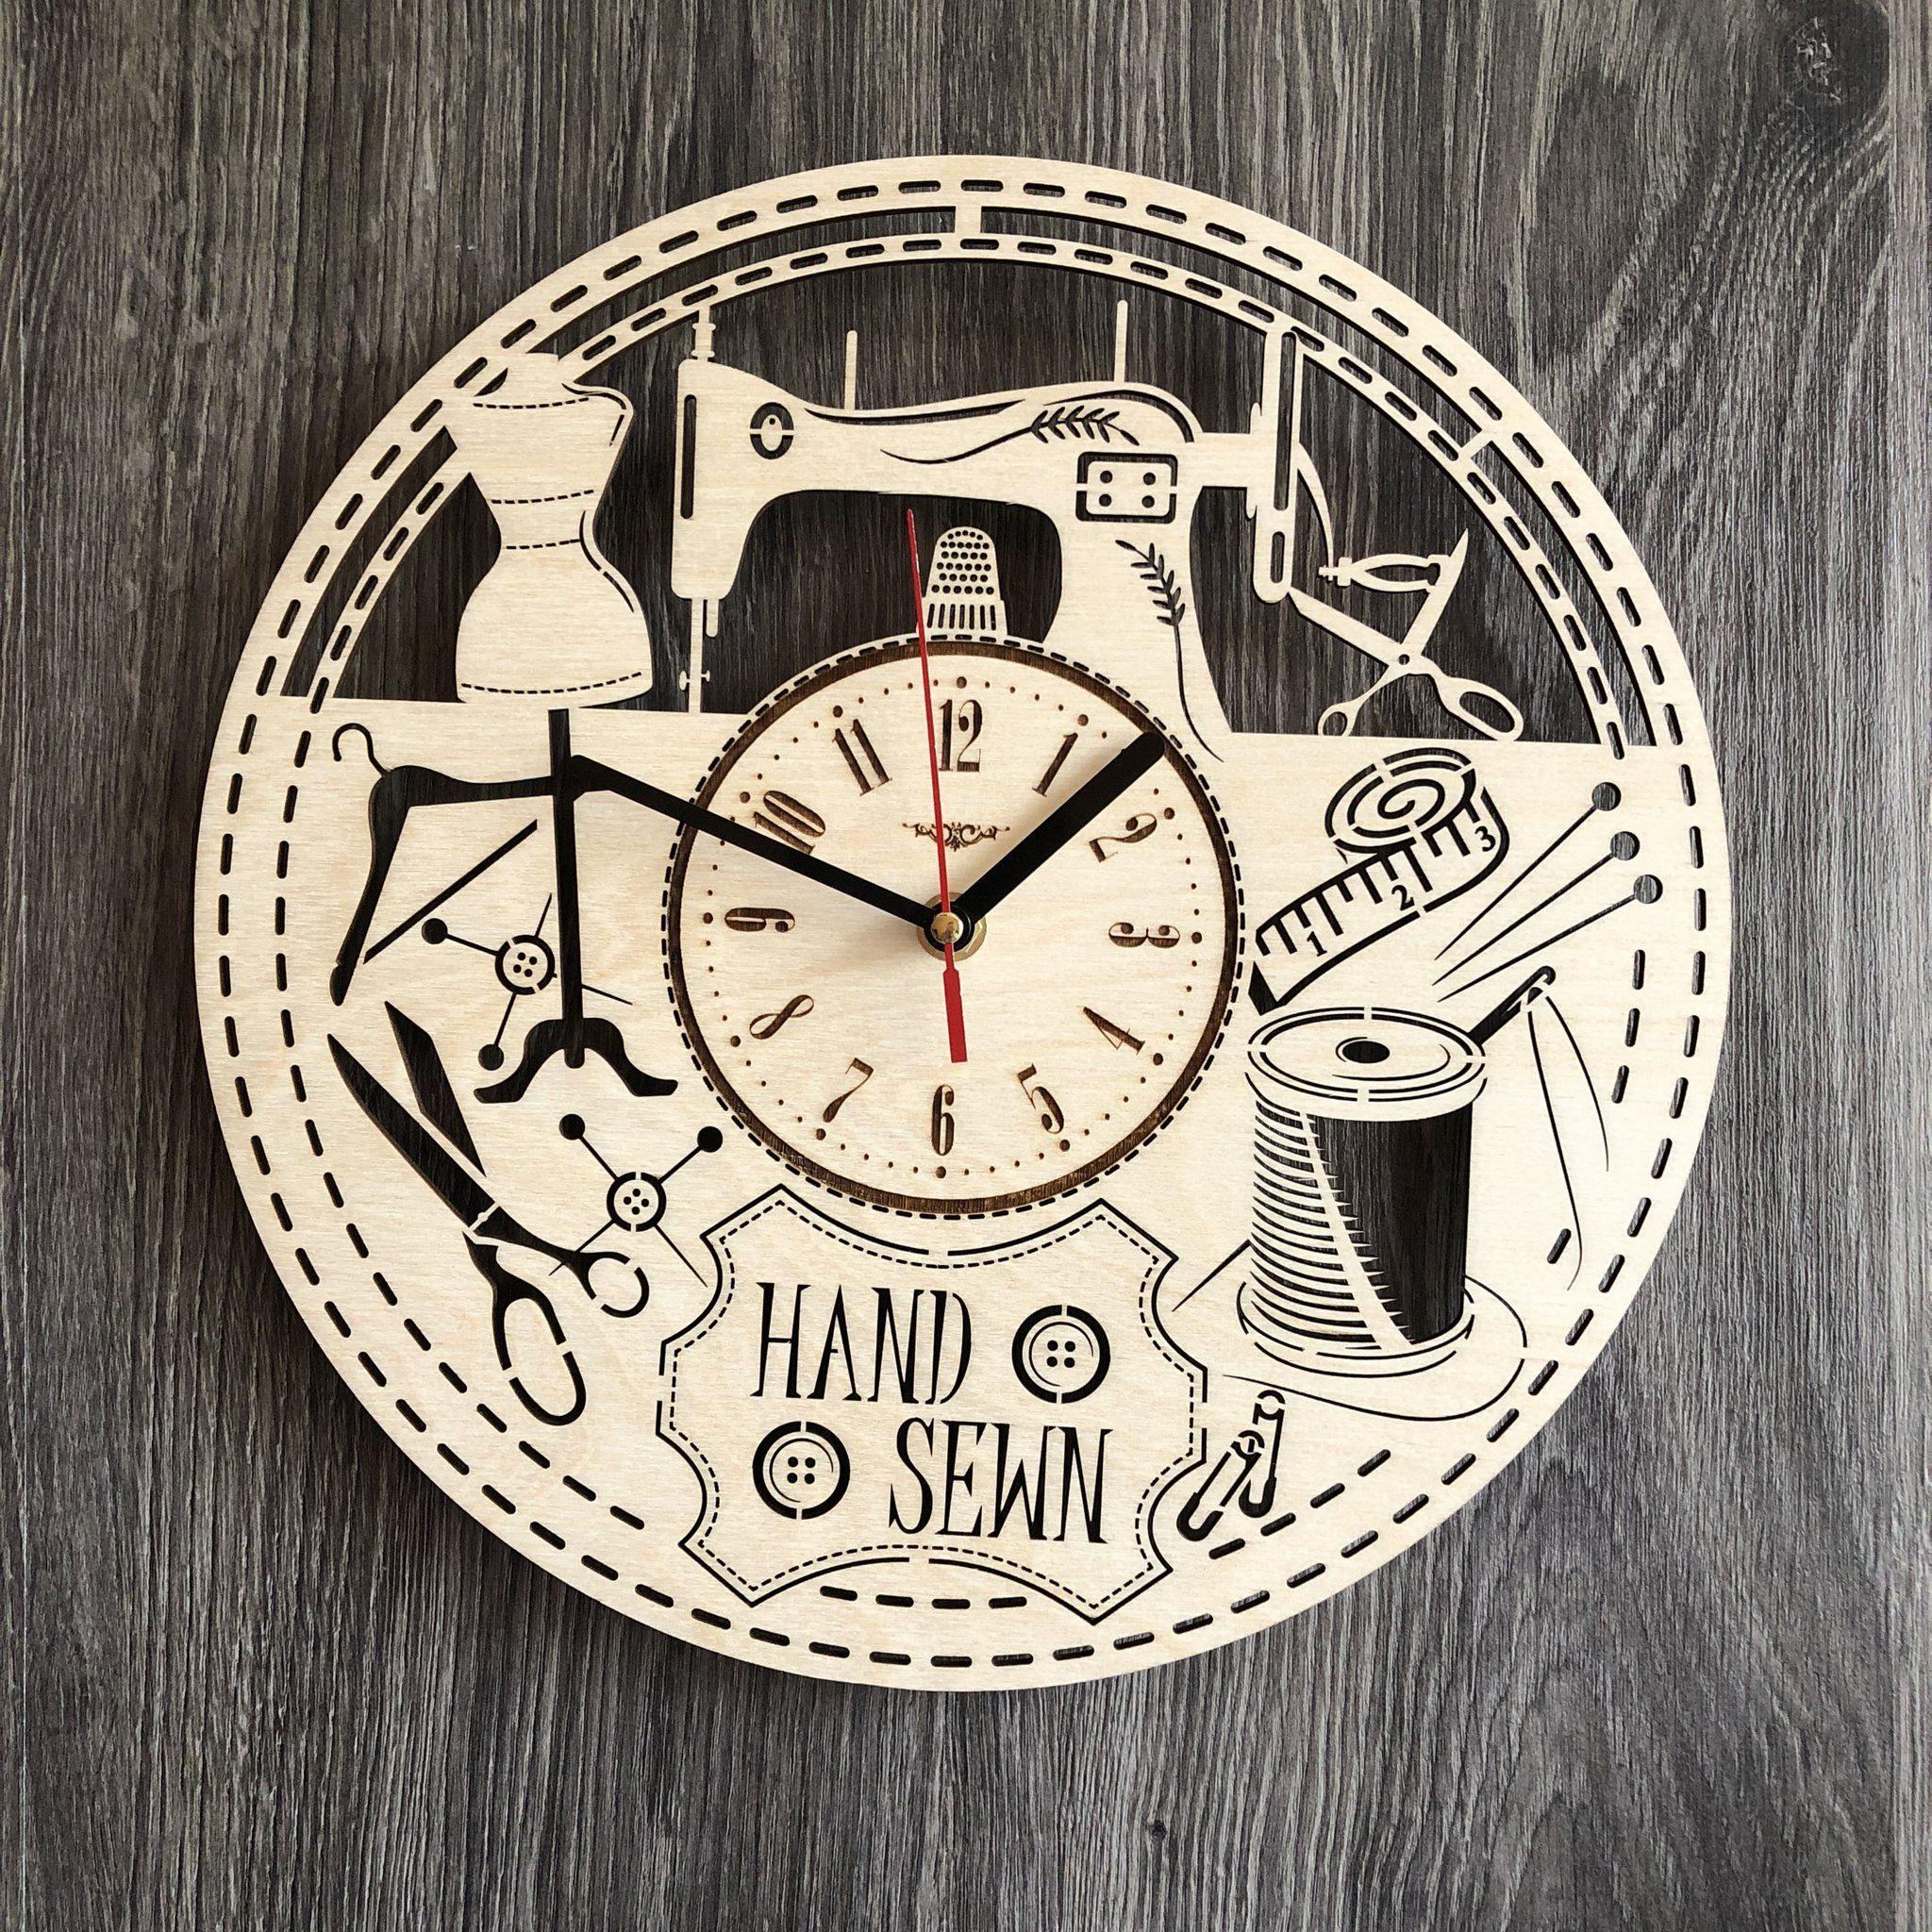 Sewing Wall Wood Clock With Images Wood Clocks Wall Clock Gift Clock Decor